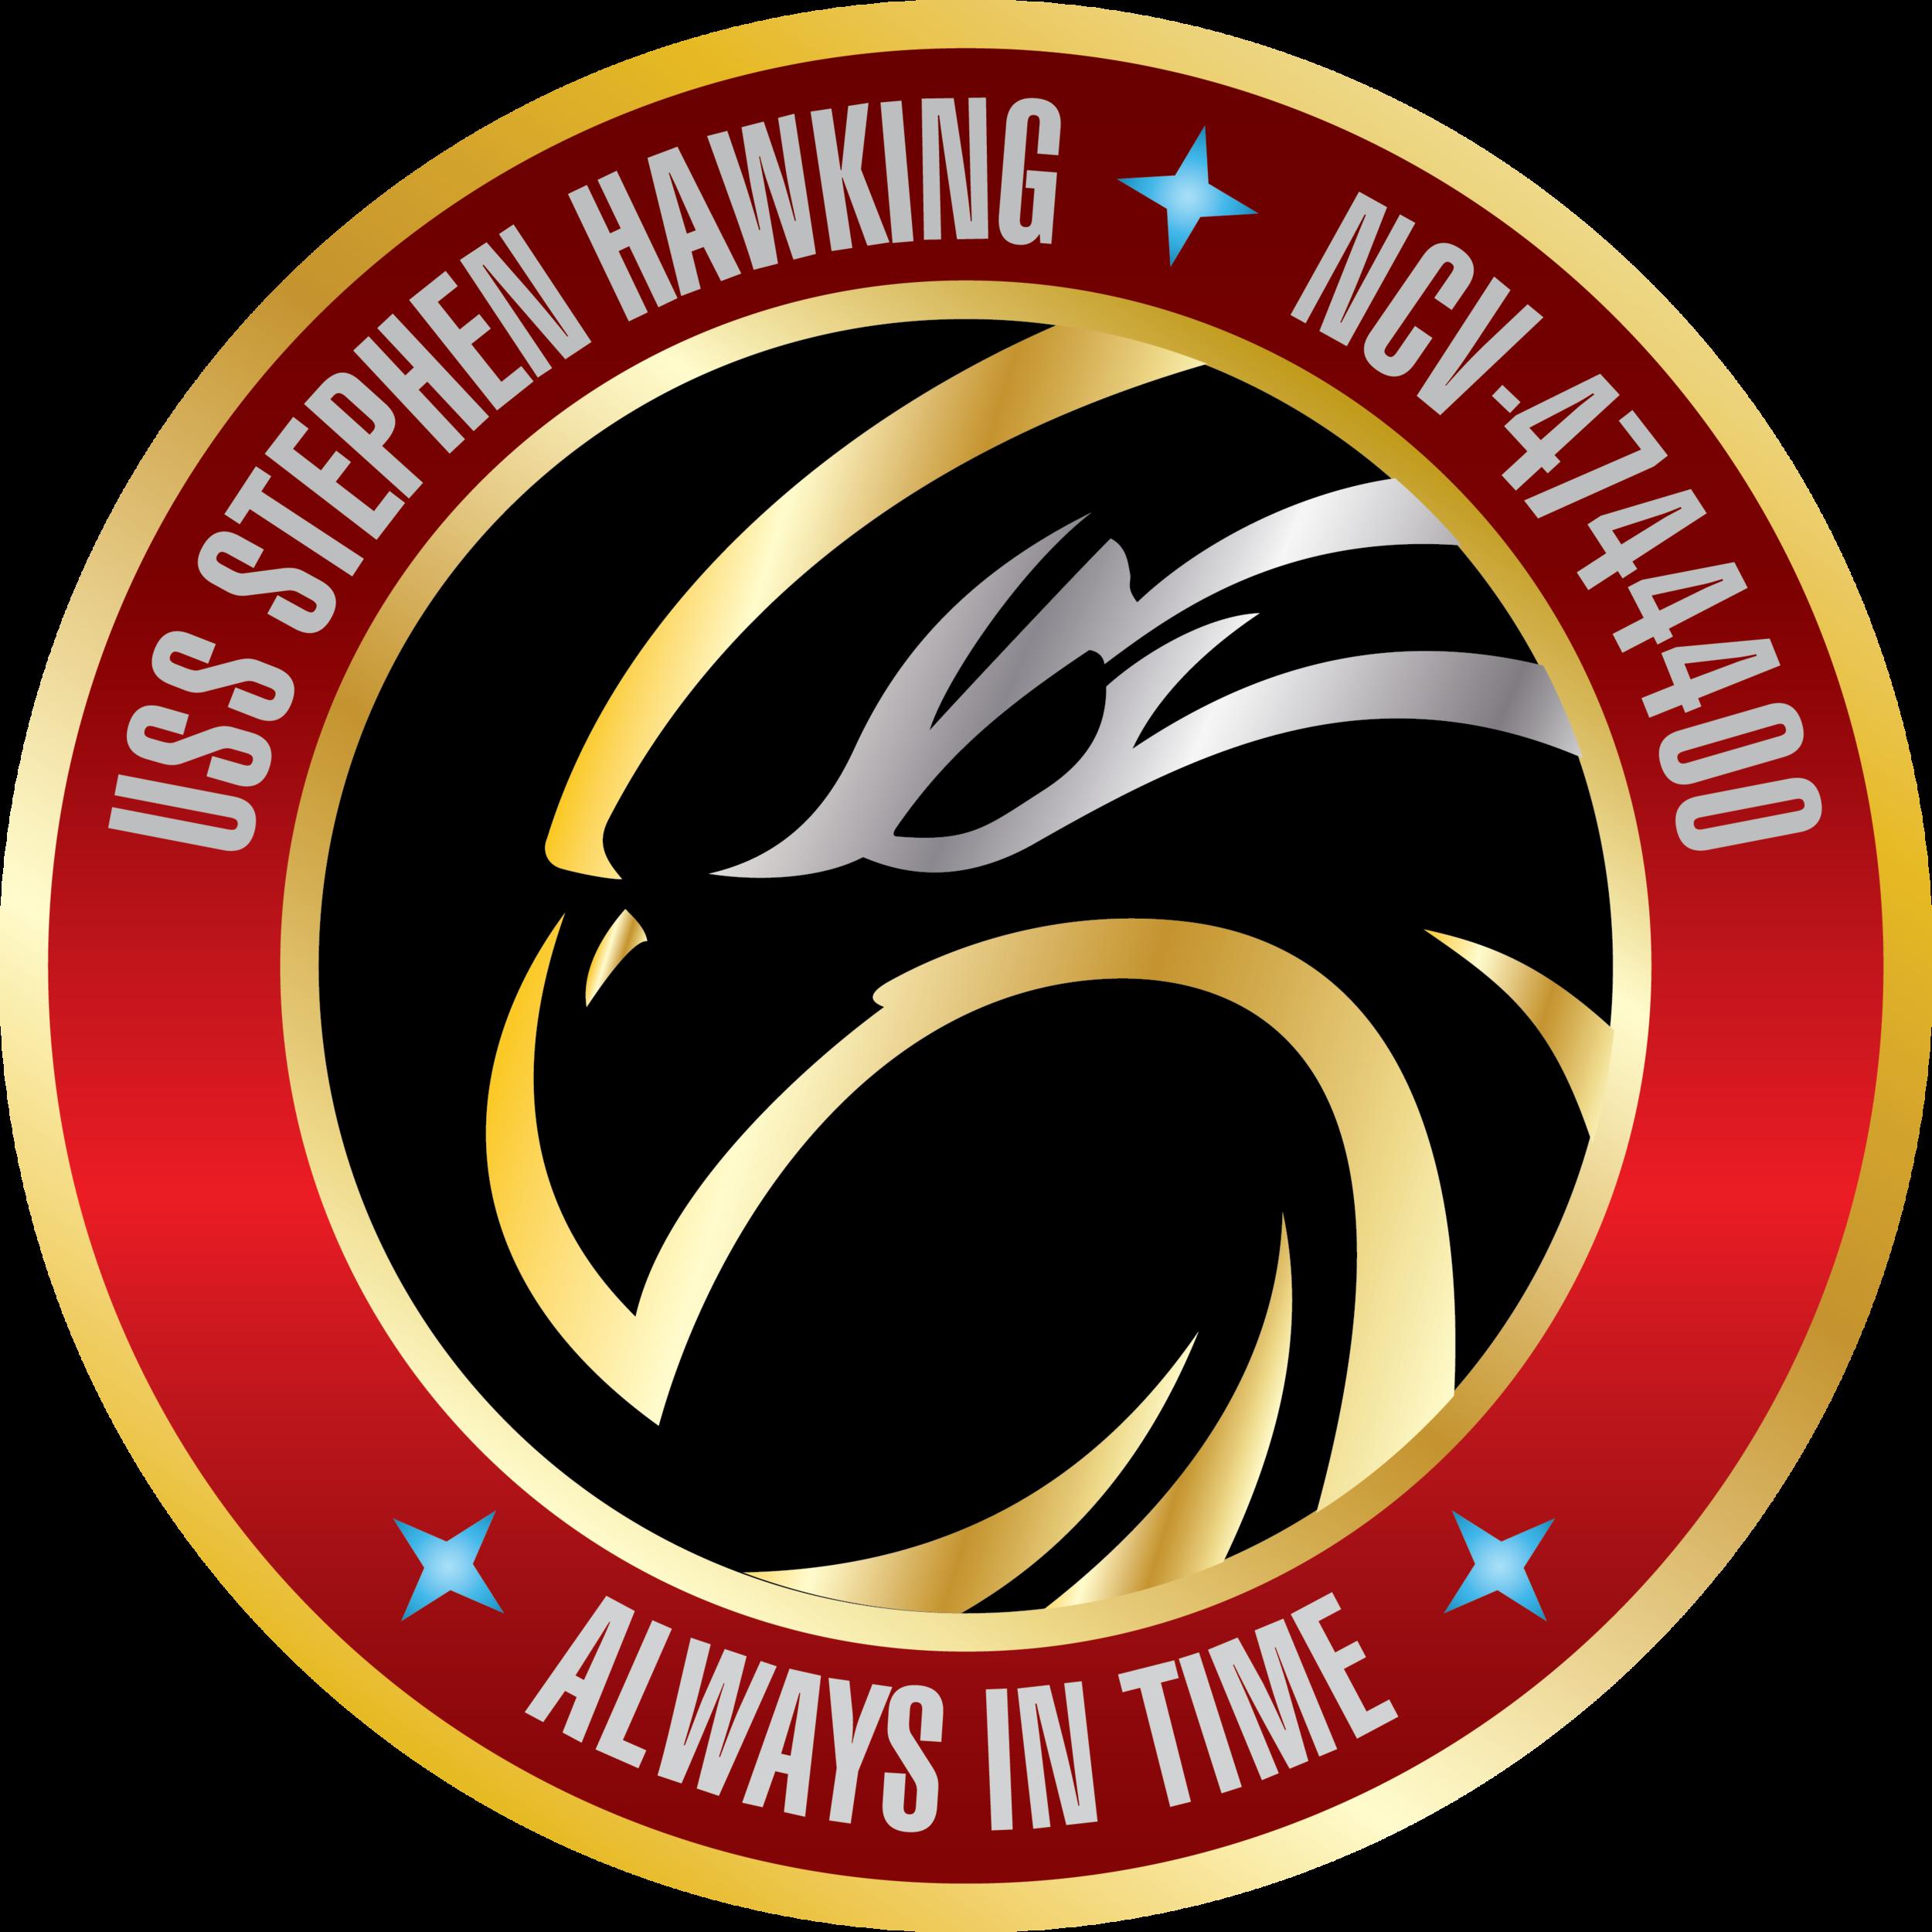 Hawking Mission Logo 3b FINAL.png